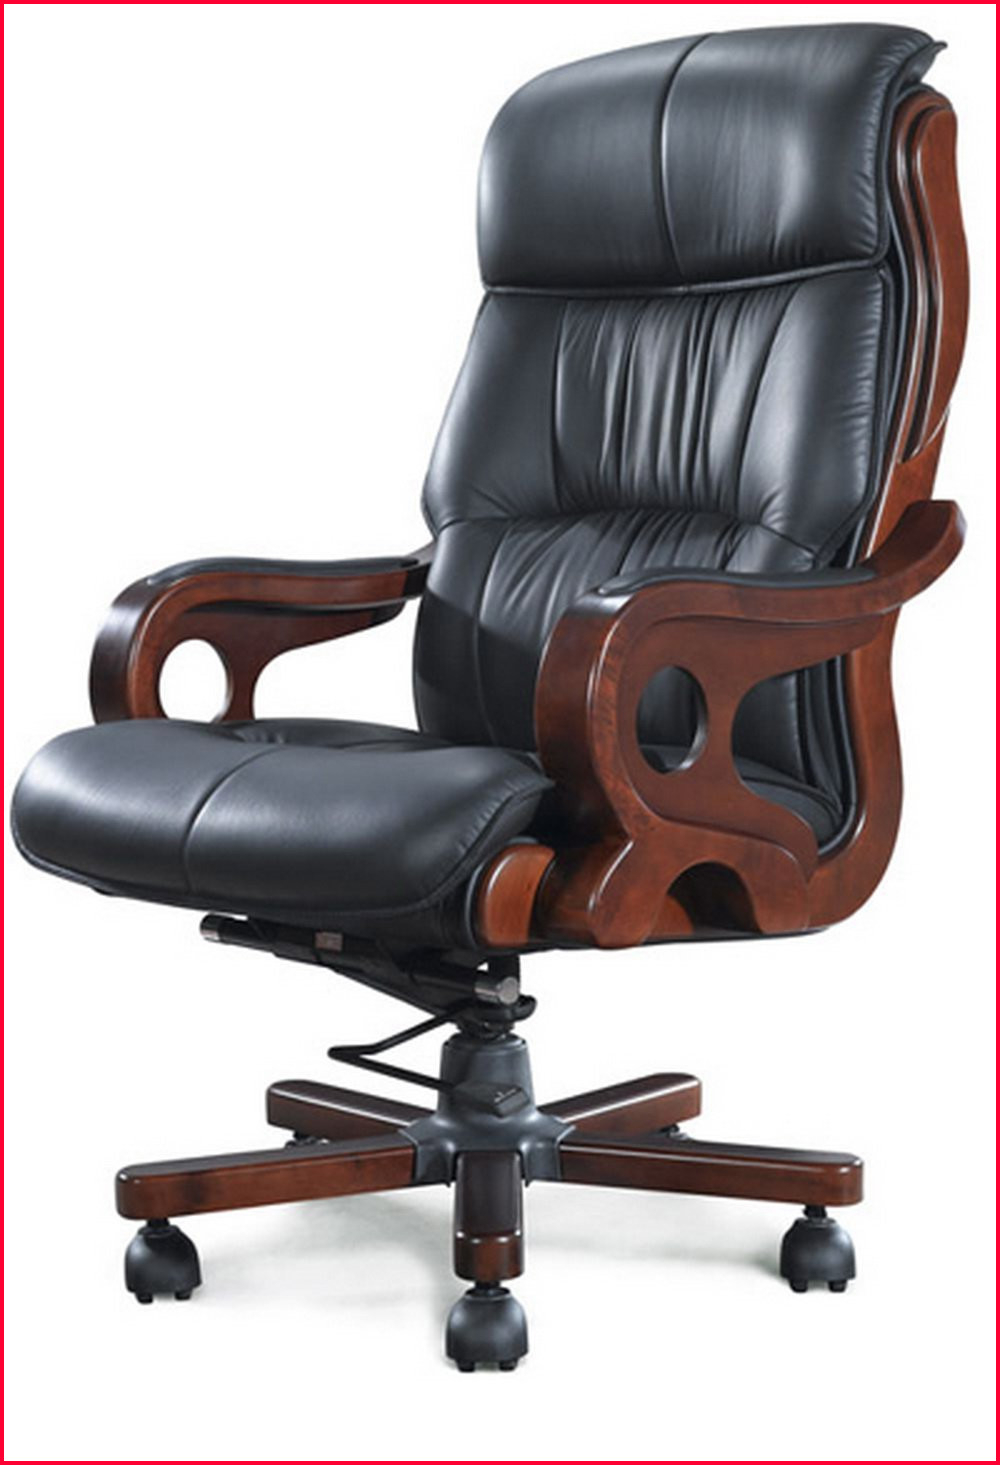 Sillas escritorio alcampo 3 cheap sillas alcampo sillas for Ofertas de sillas de oficina en carrefour